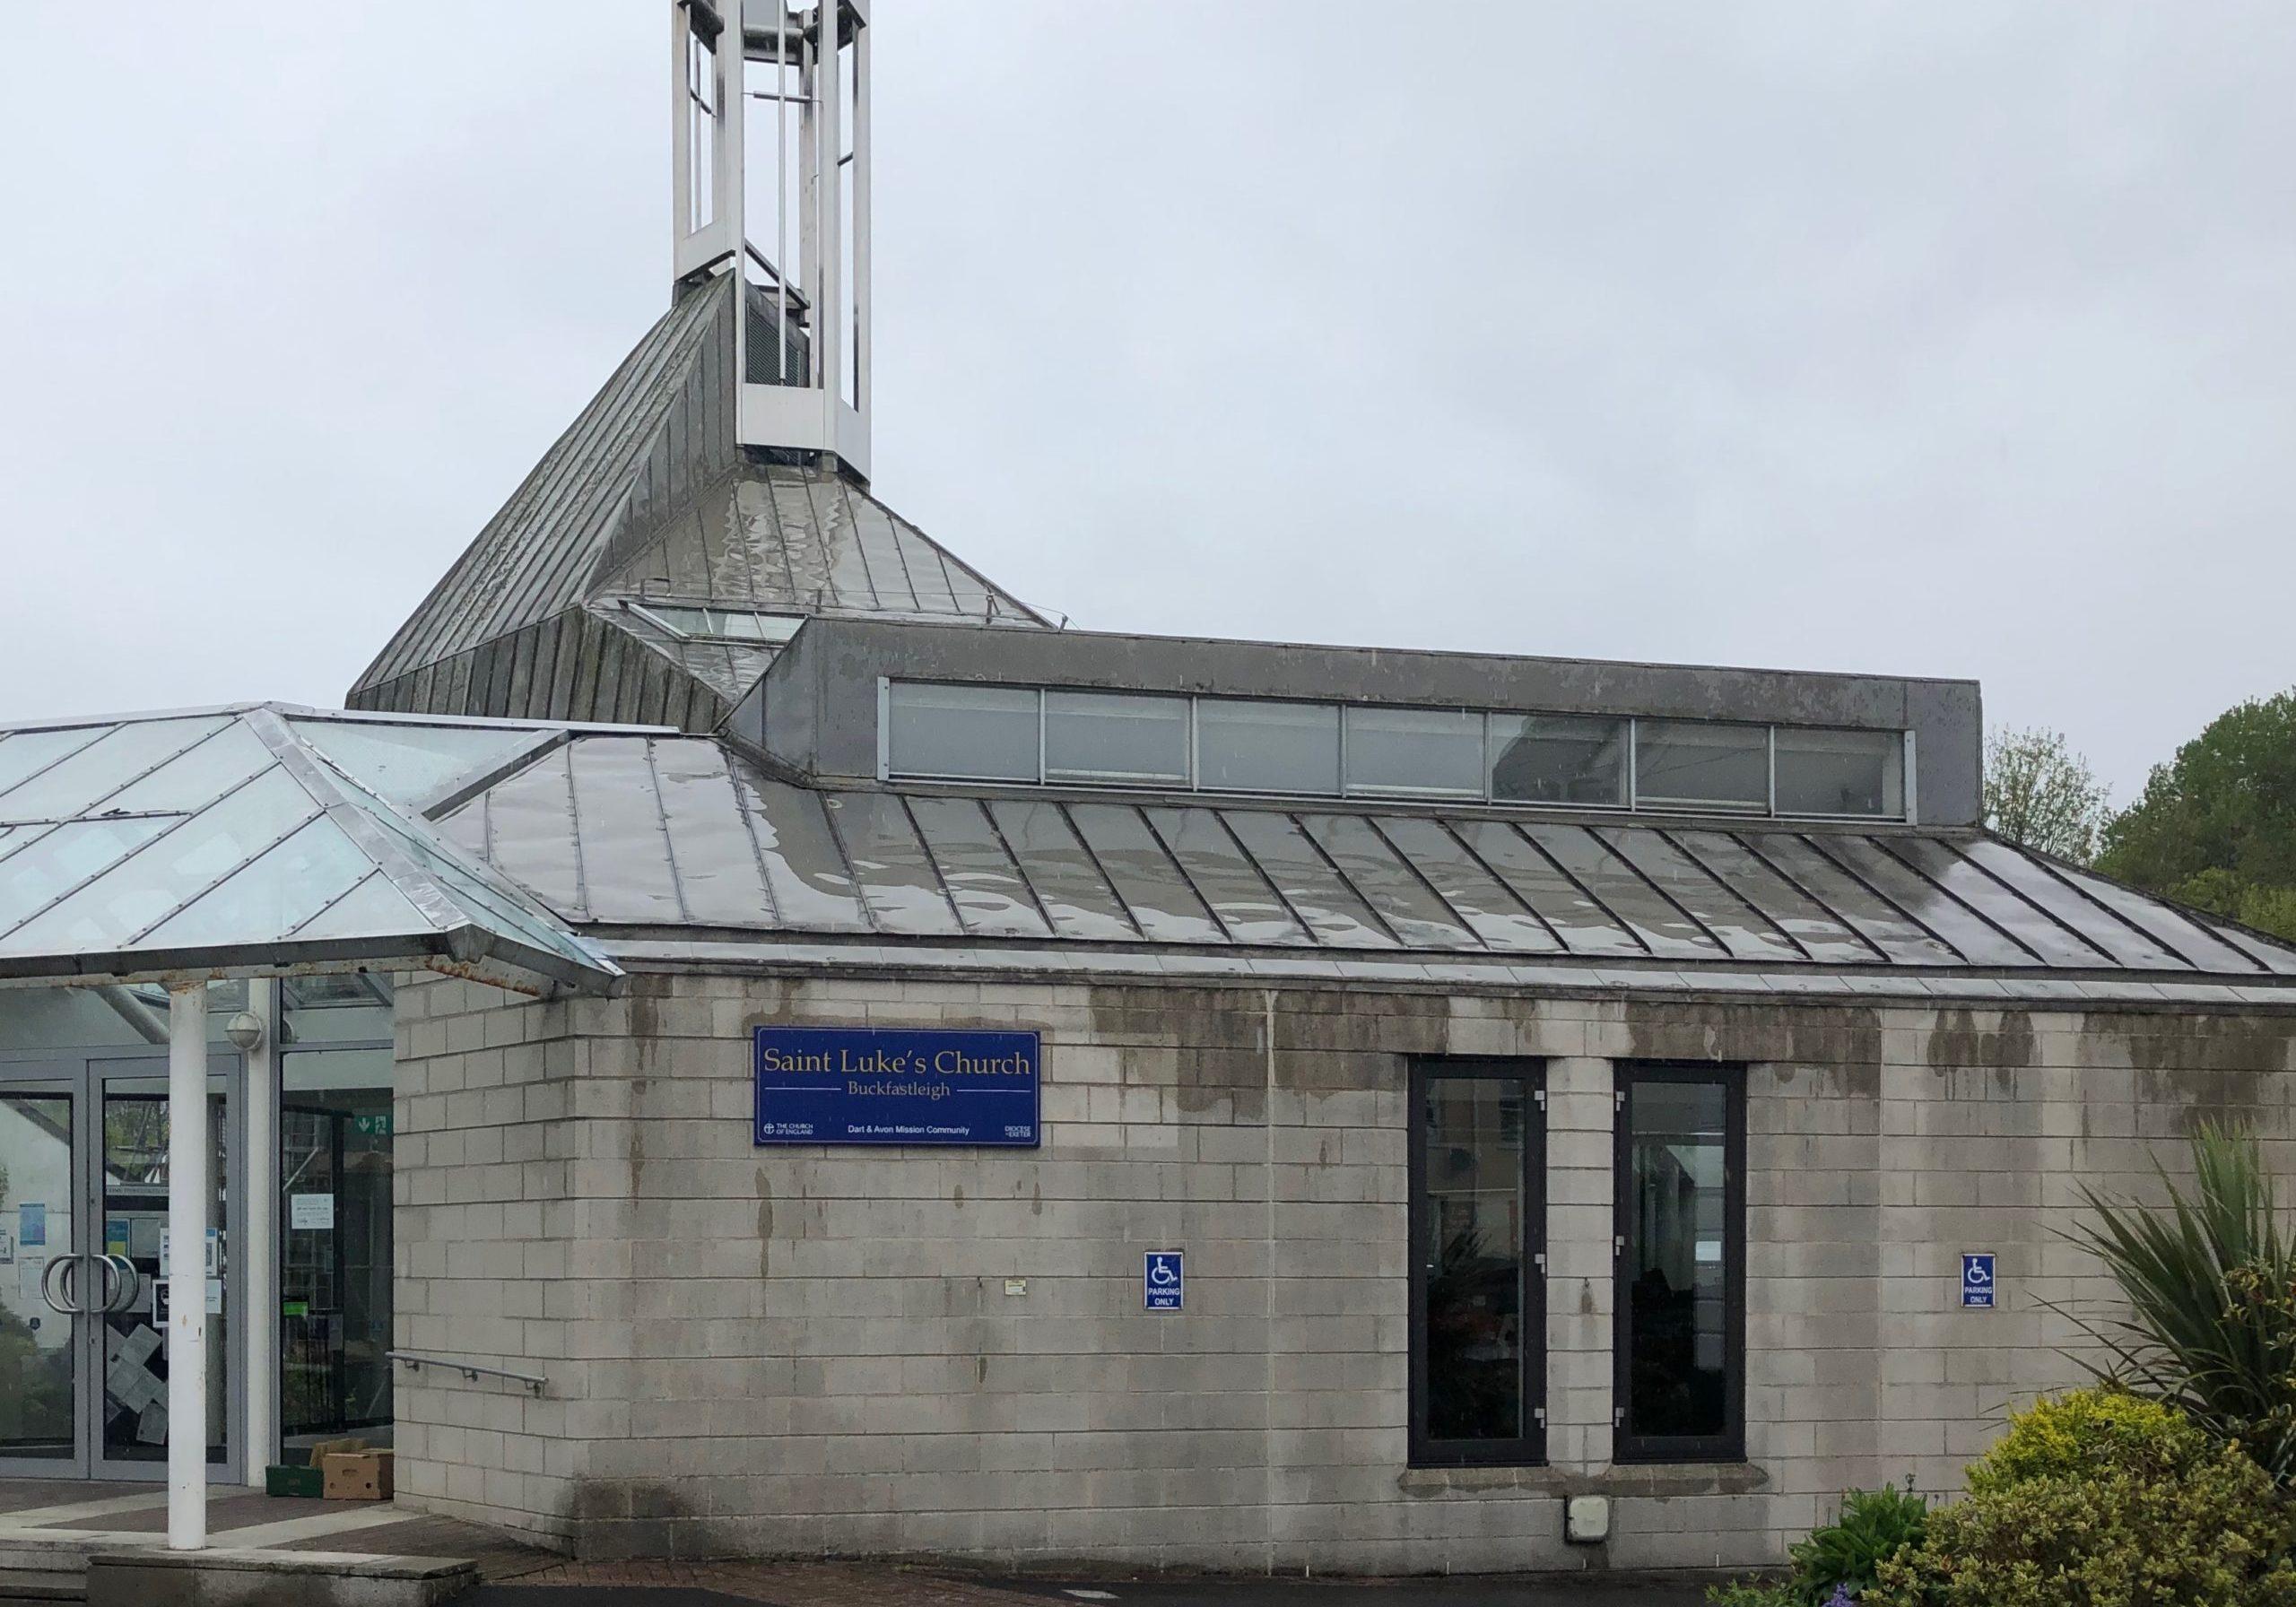 St-Lukes-Church-Buckfastleigh-front-of-church.jpeg